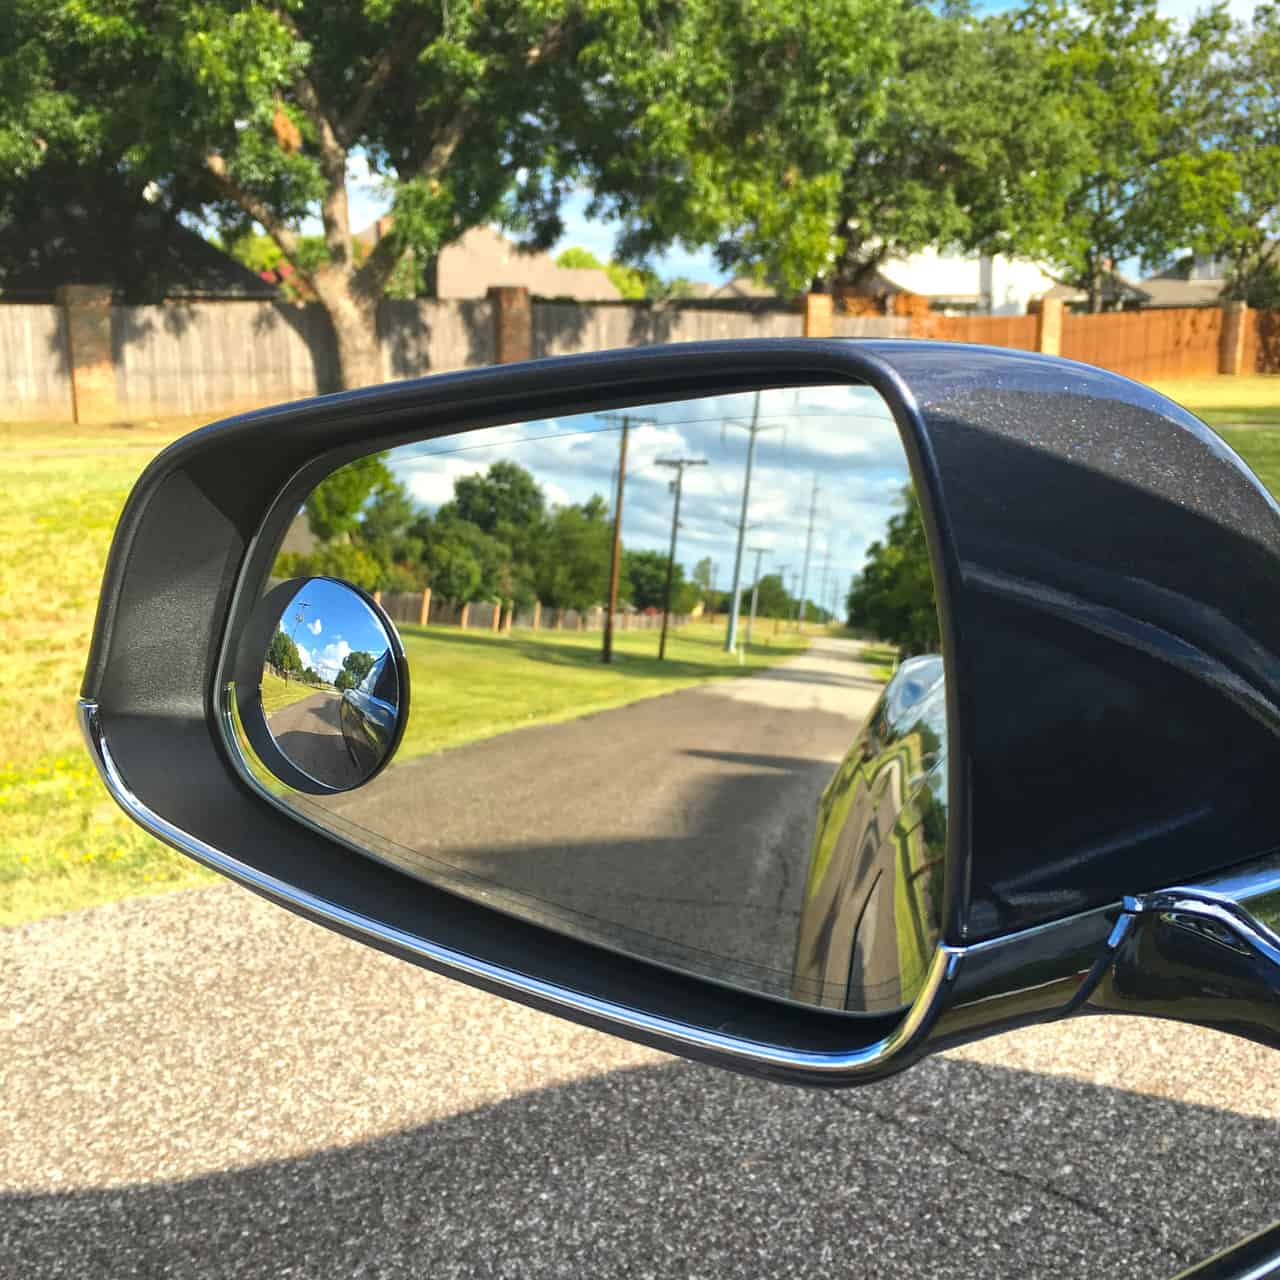 Small circular convex mirror